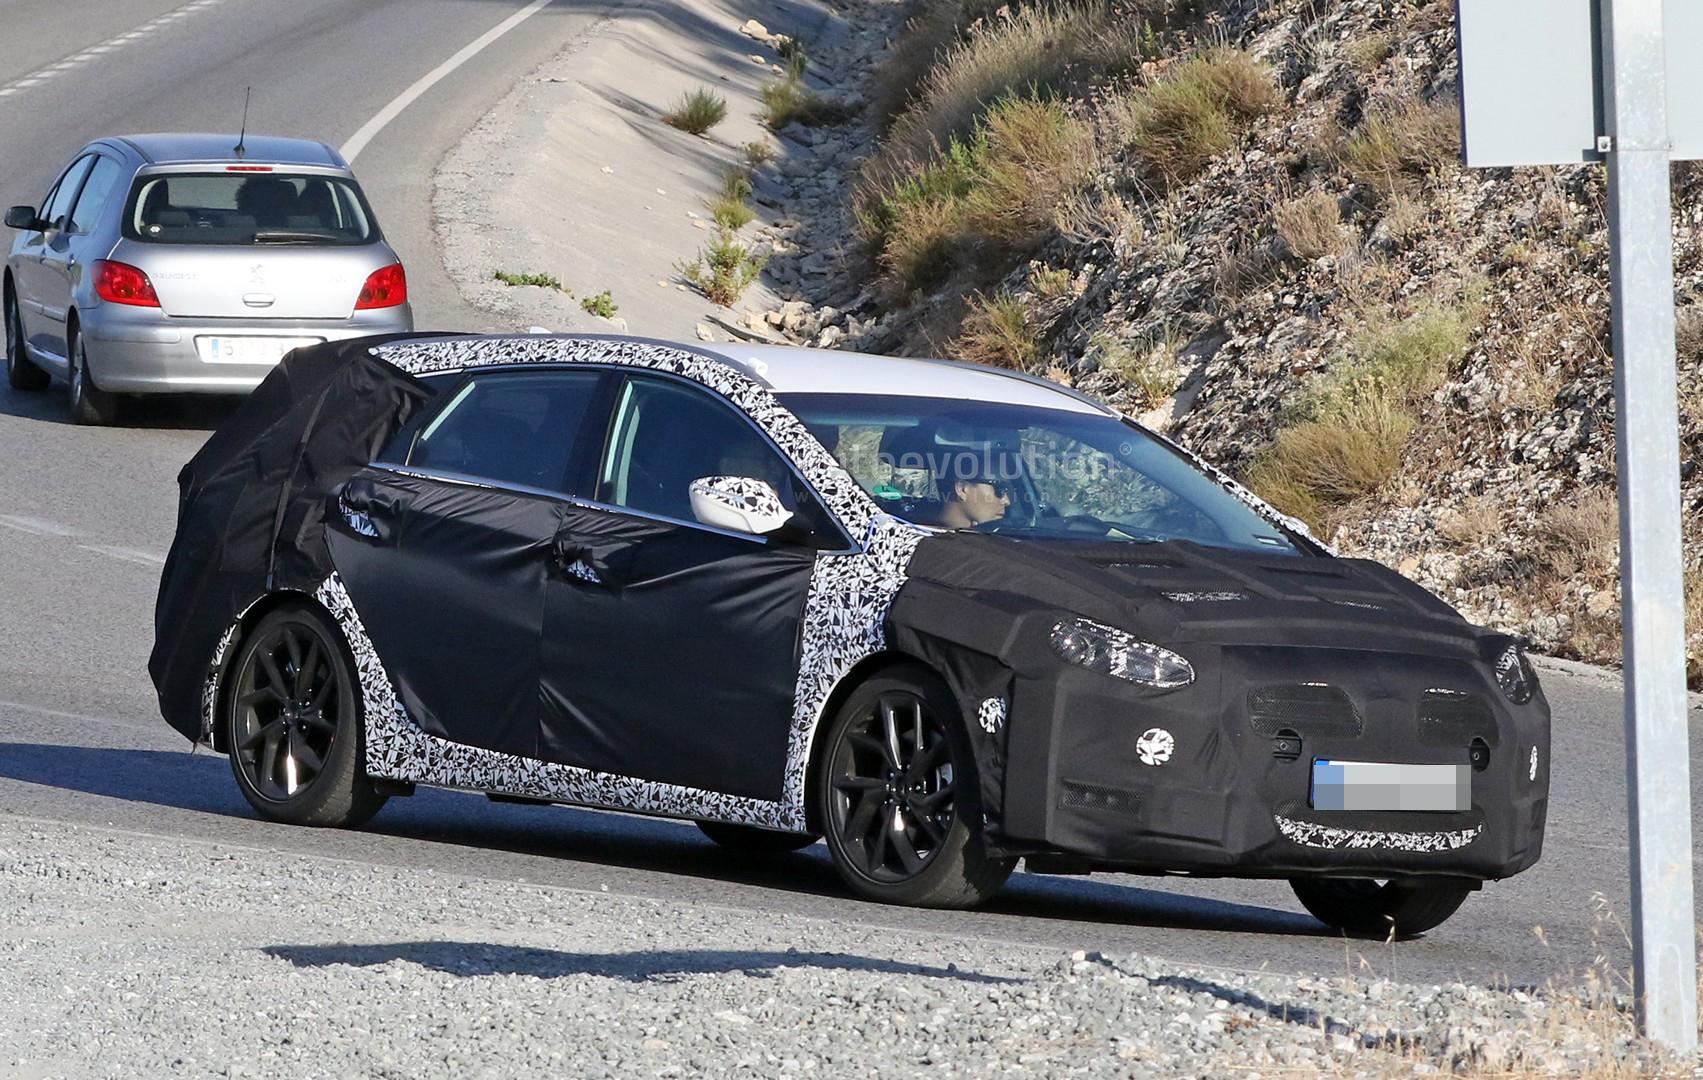 Hyundai Spy Shots >> Spyshots: 2019 Hyundai i40 Wagon Begins Testing - autoevolution